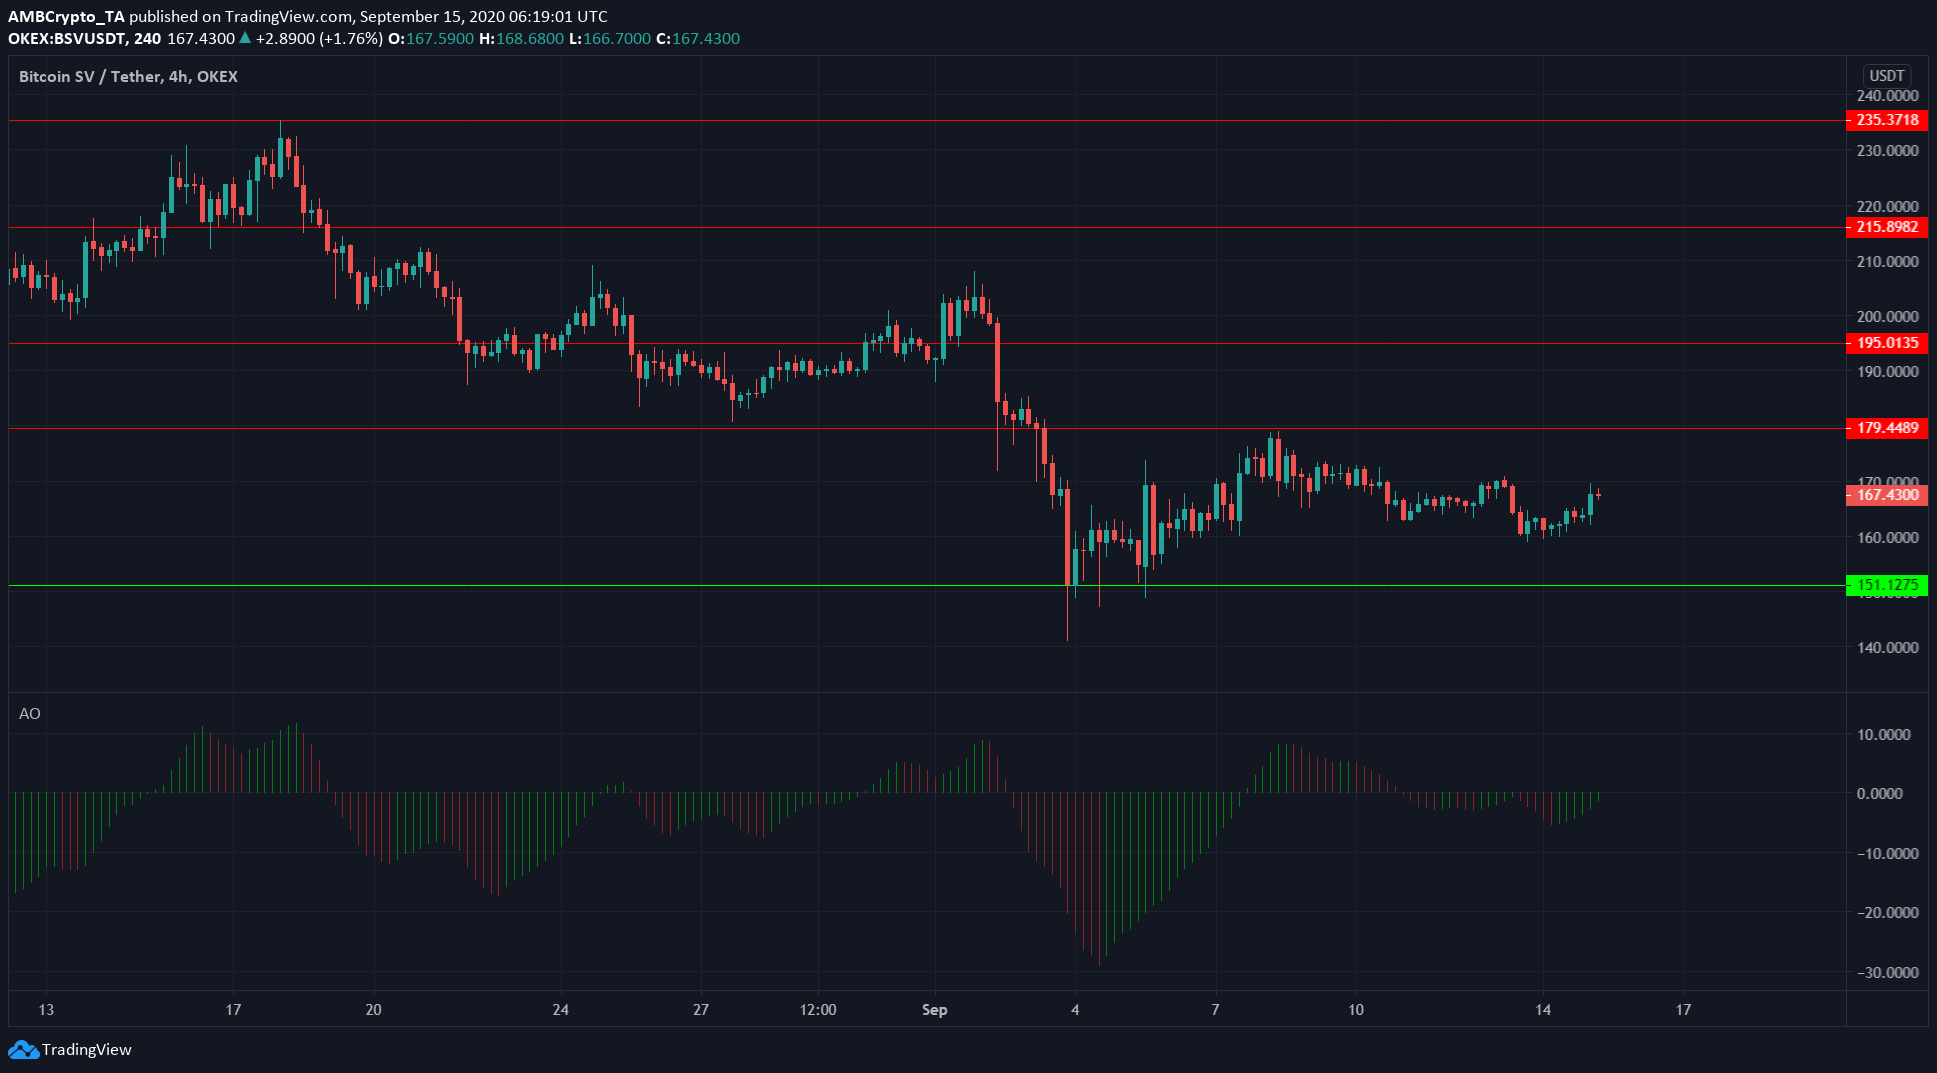 Bitcoin SV, Dash, Ethereum Classic Price Analysis: 15 September